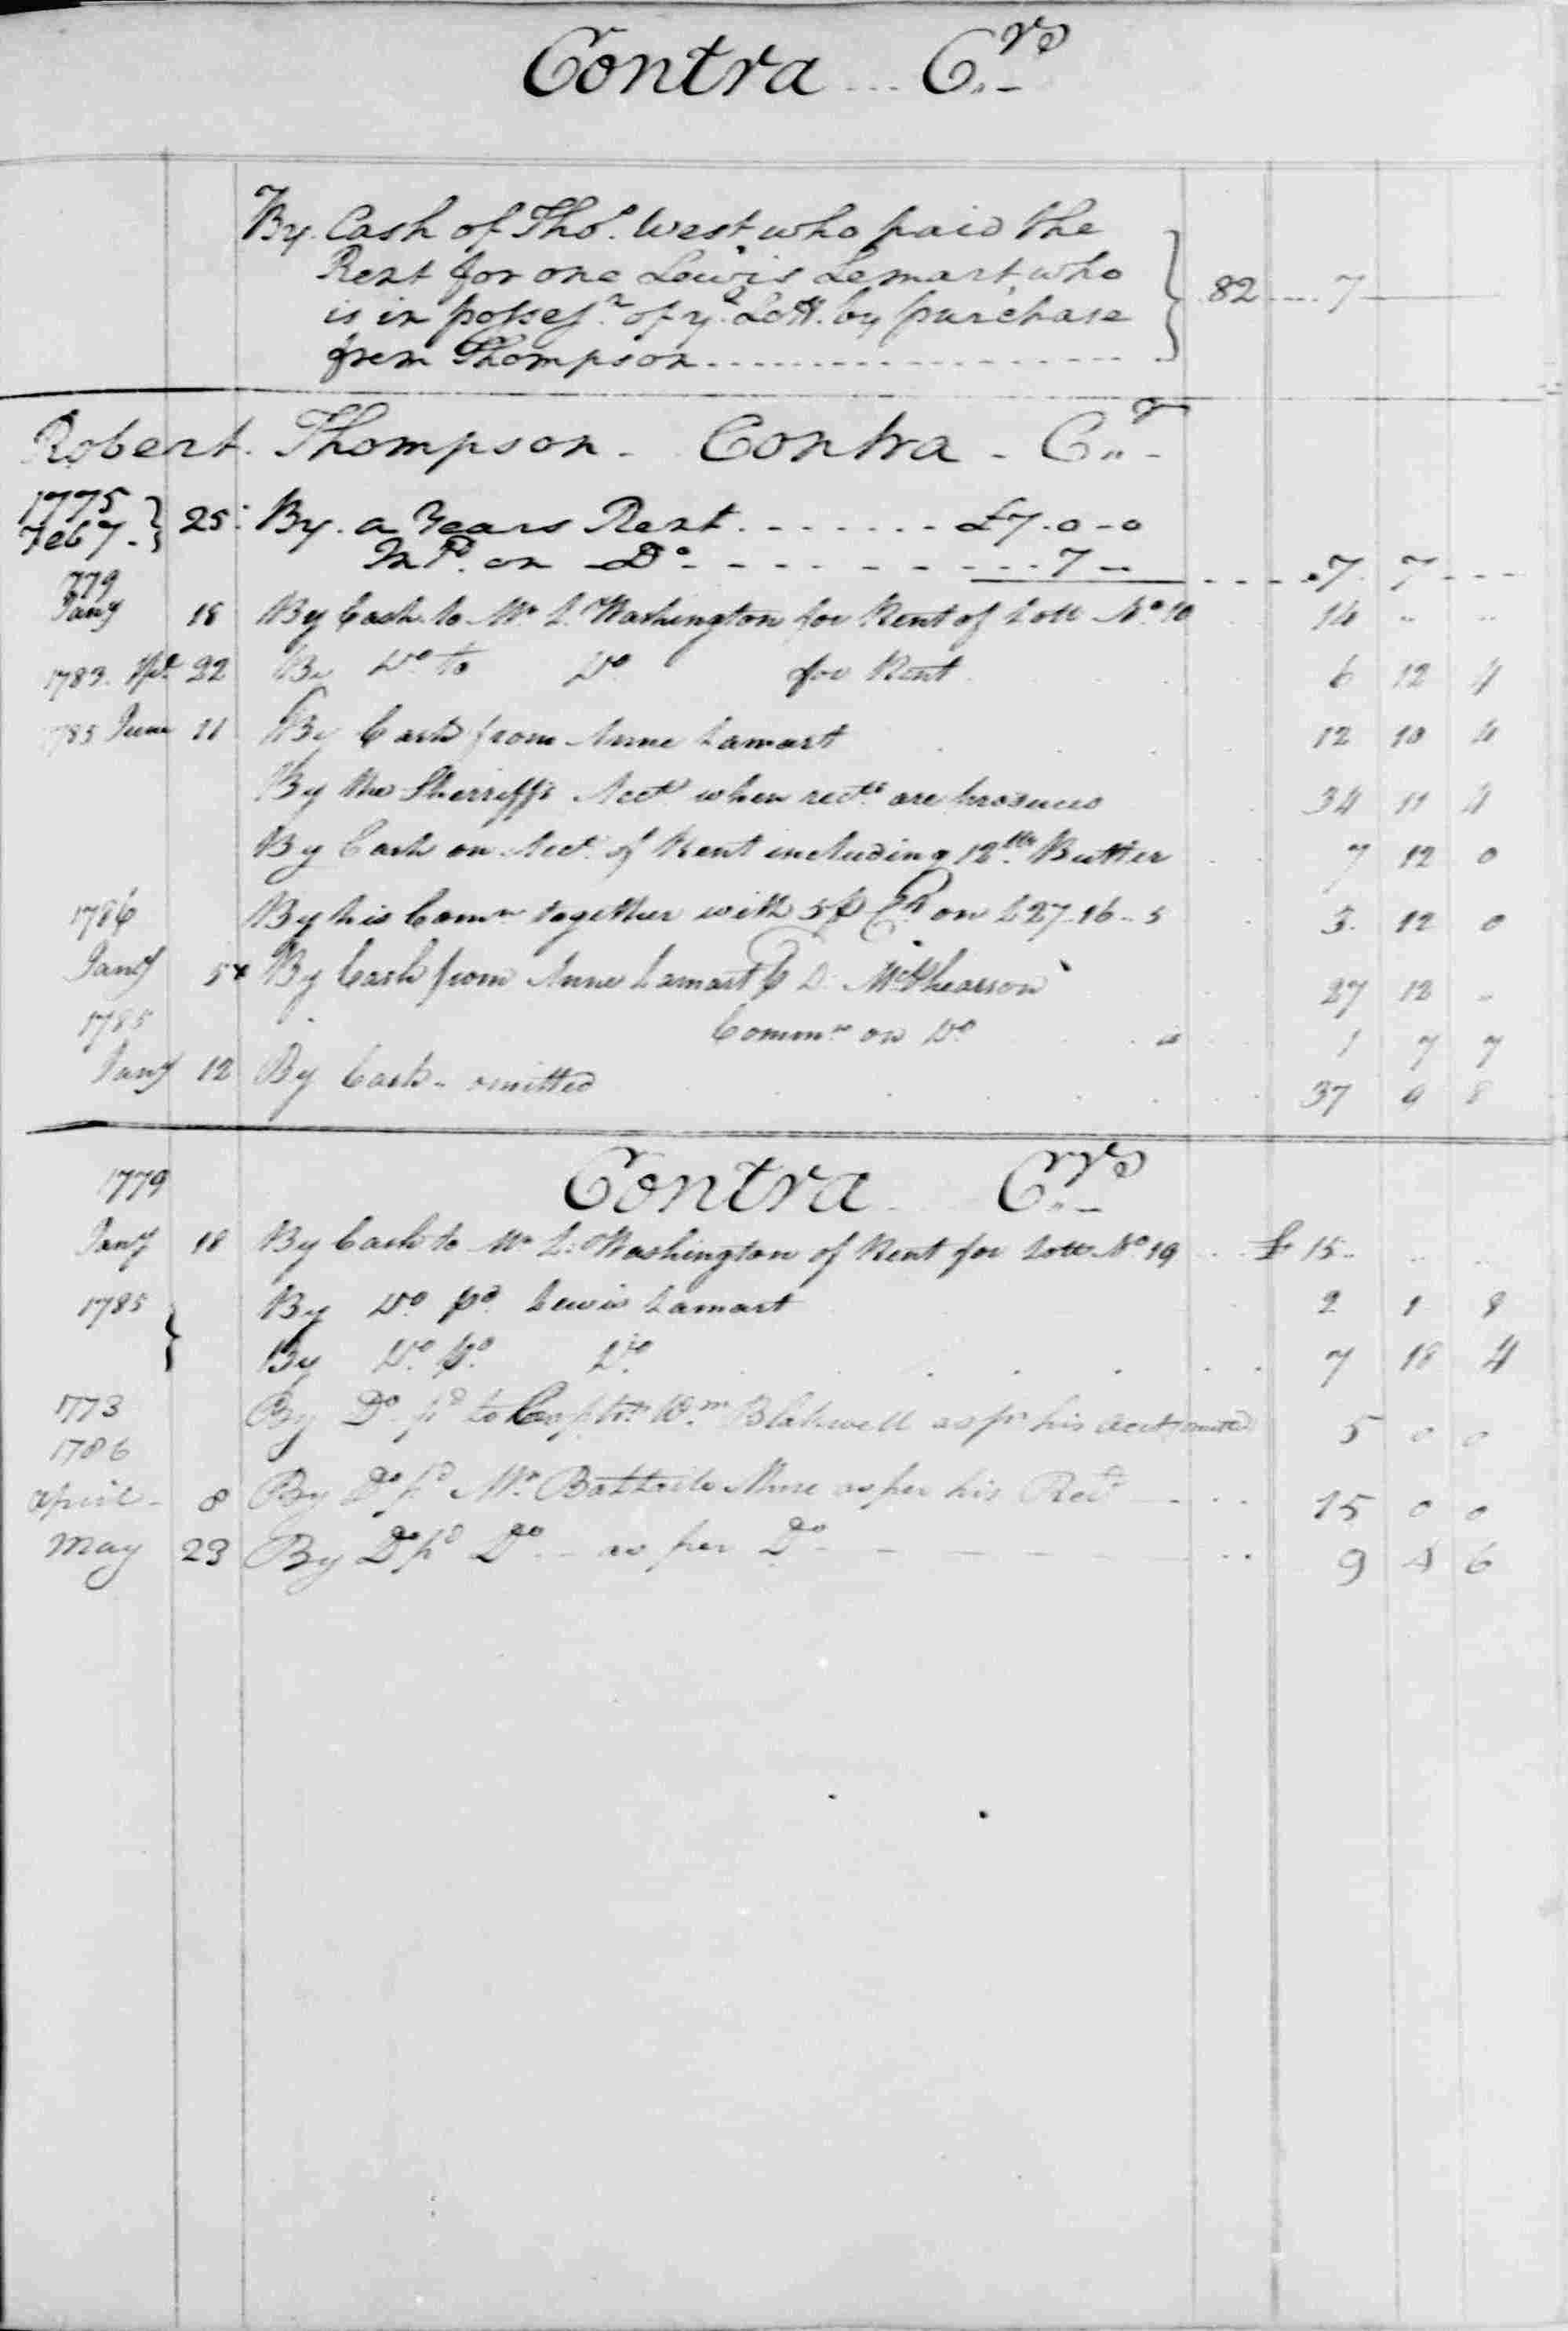 Ledger B, folio 68, right side